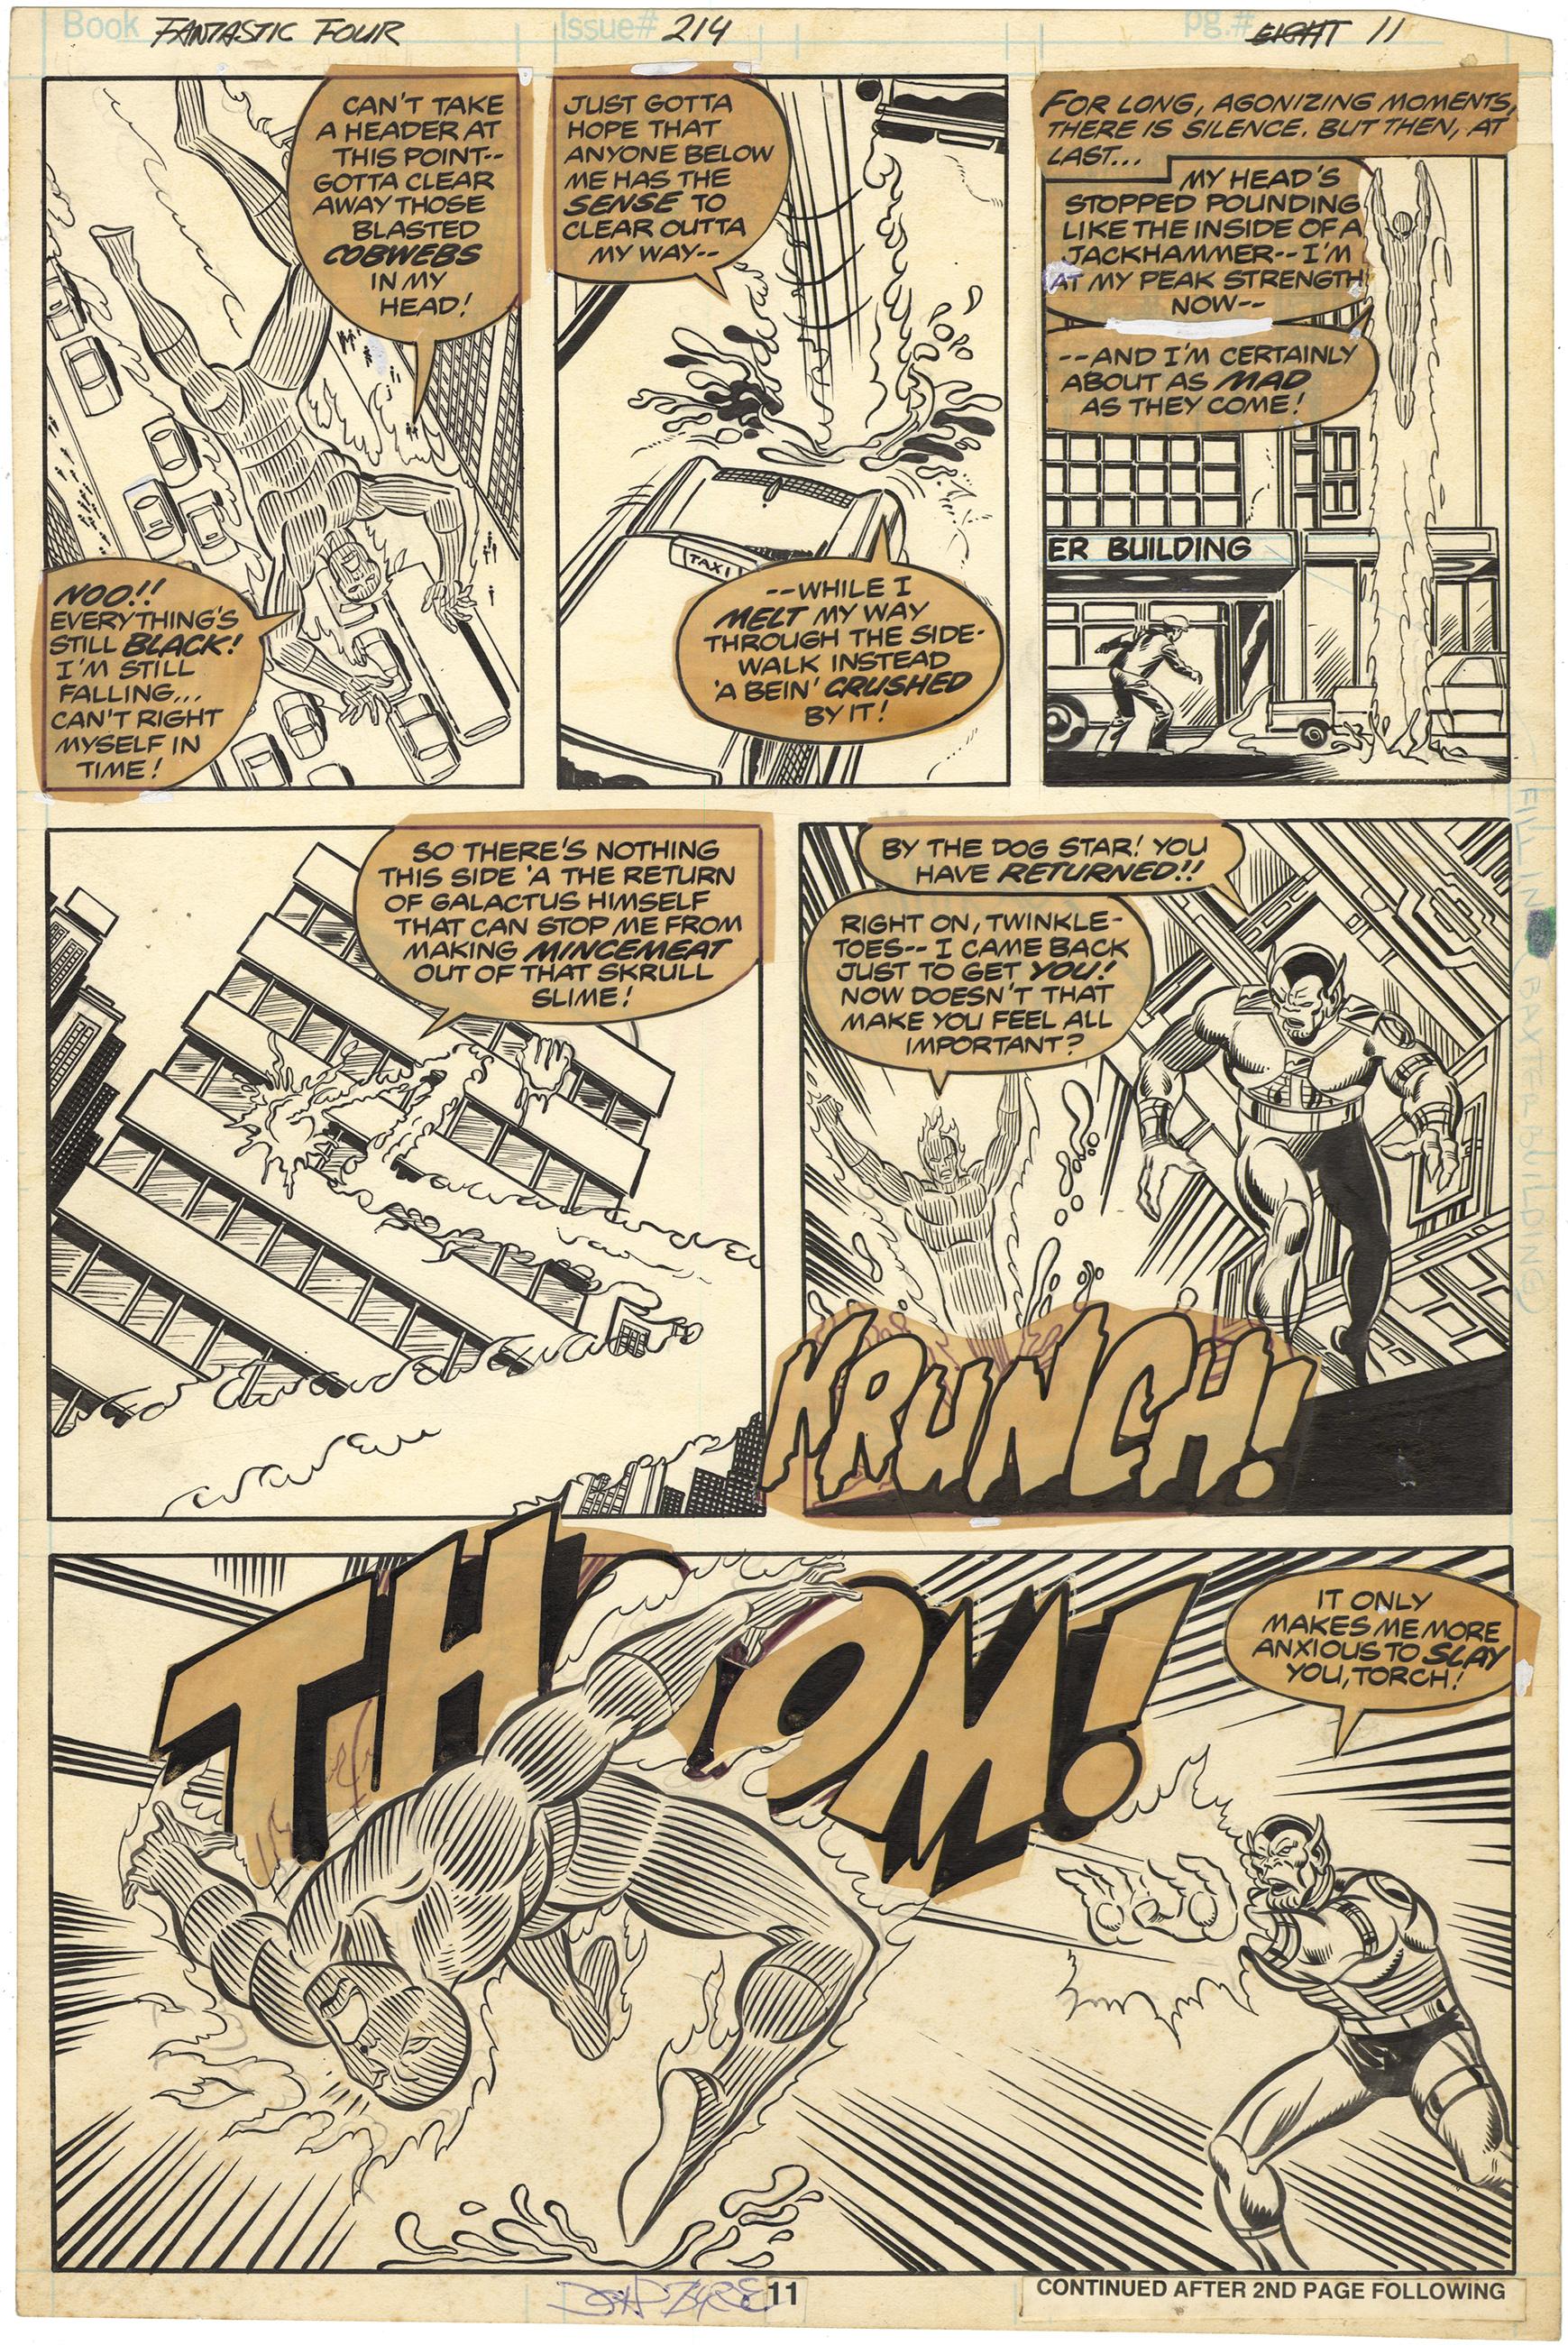 Fantastic Four #214 p11 (Signed)